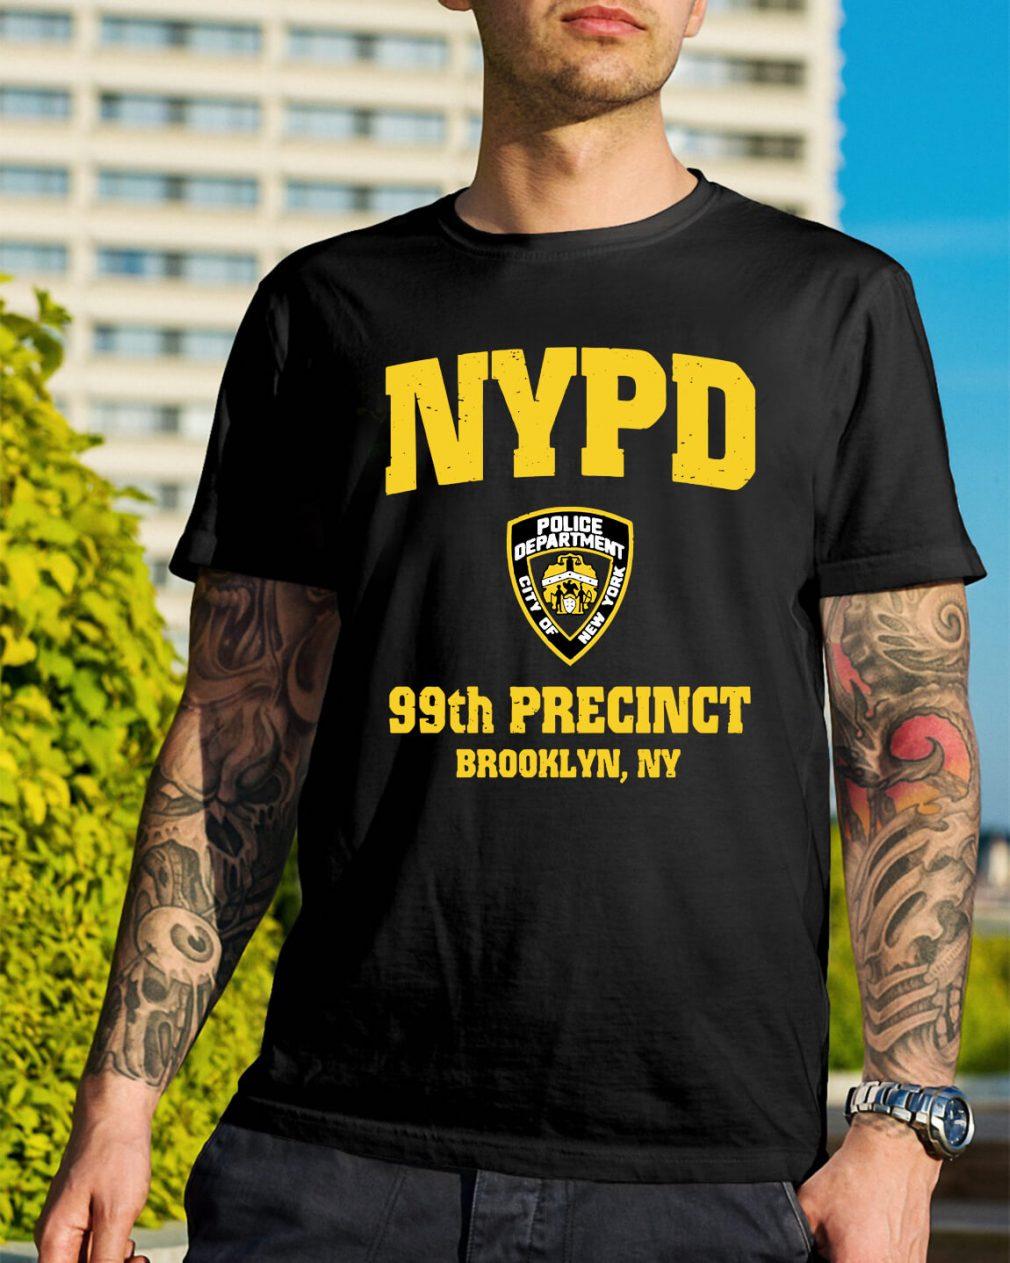 99th Precinct Brooklyn NY Police Department NYPD shirt